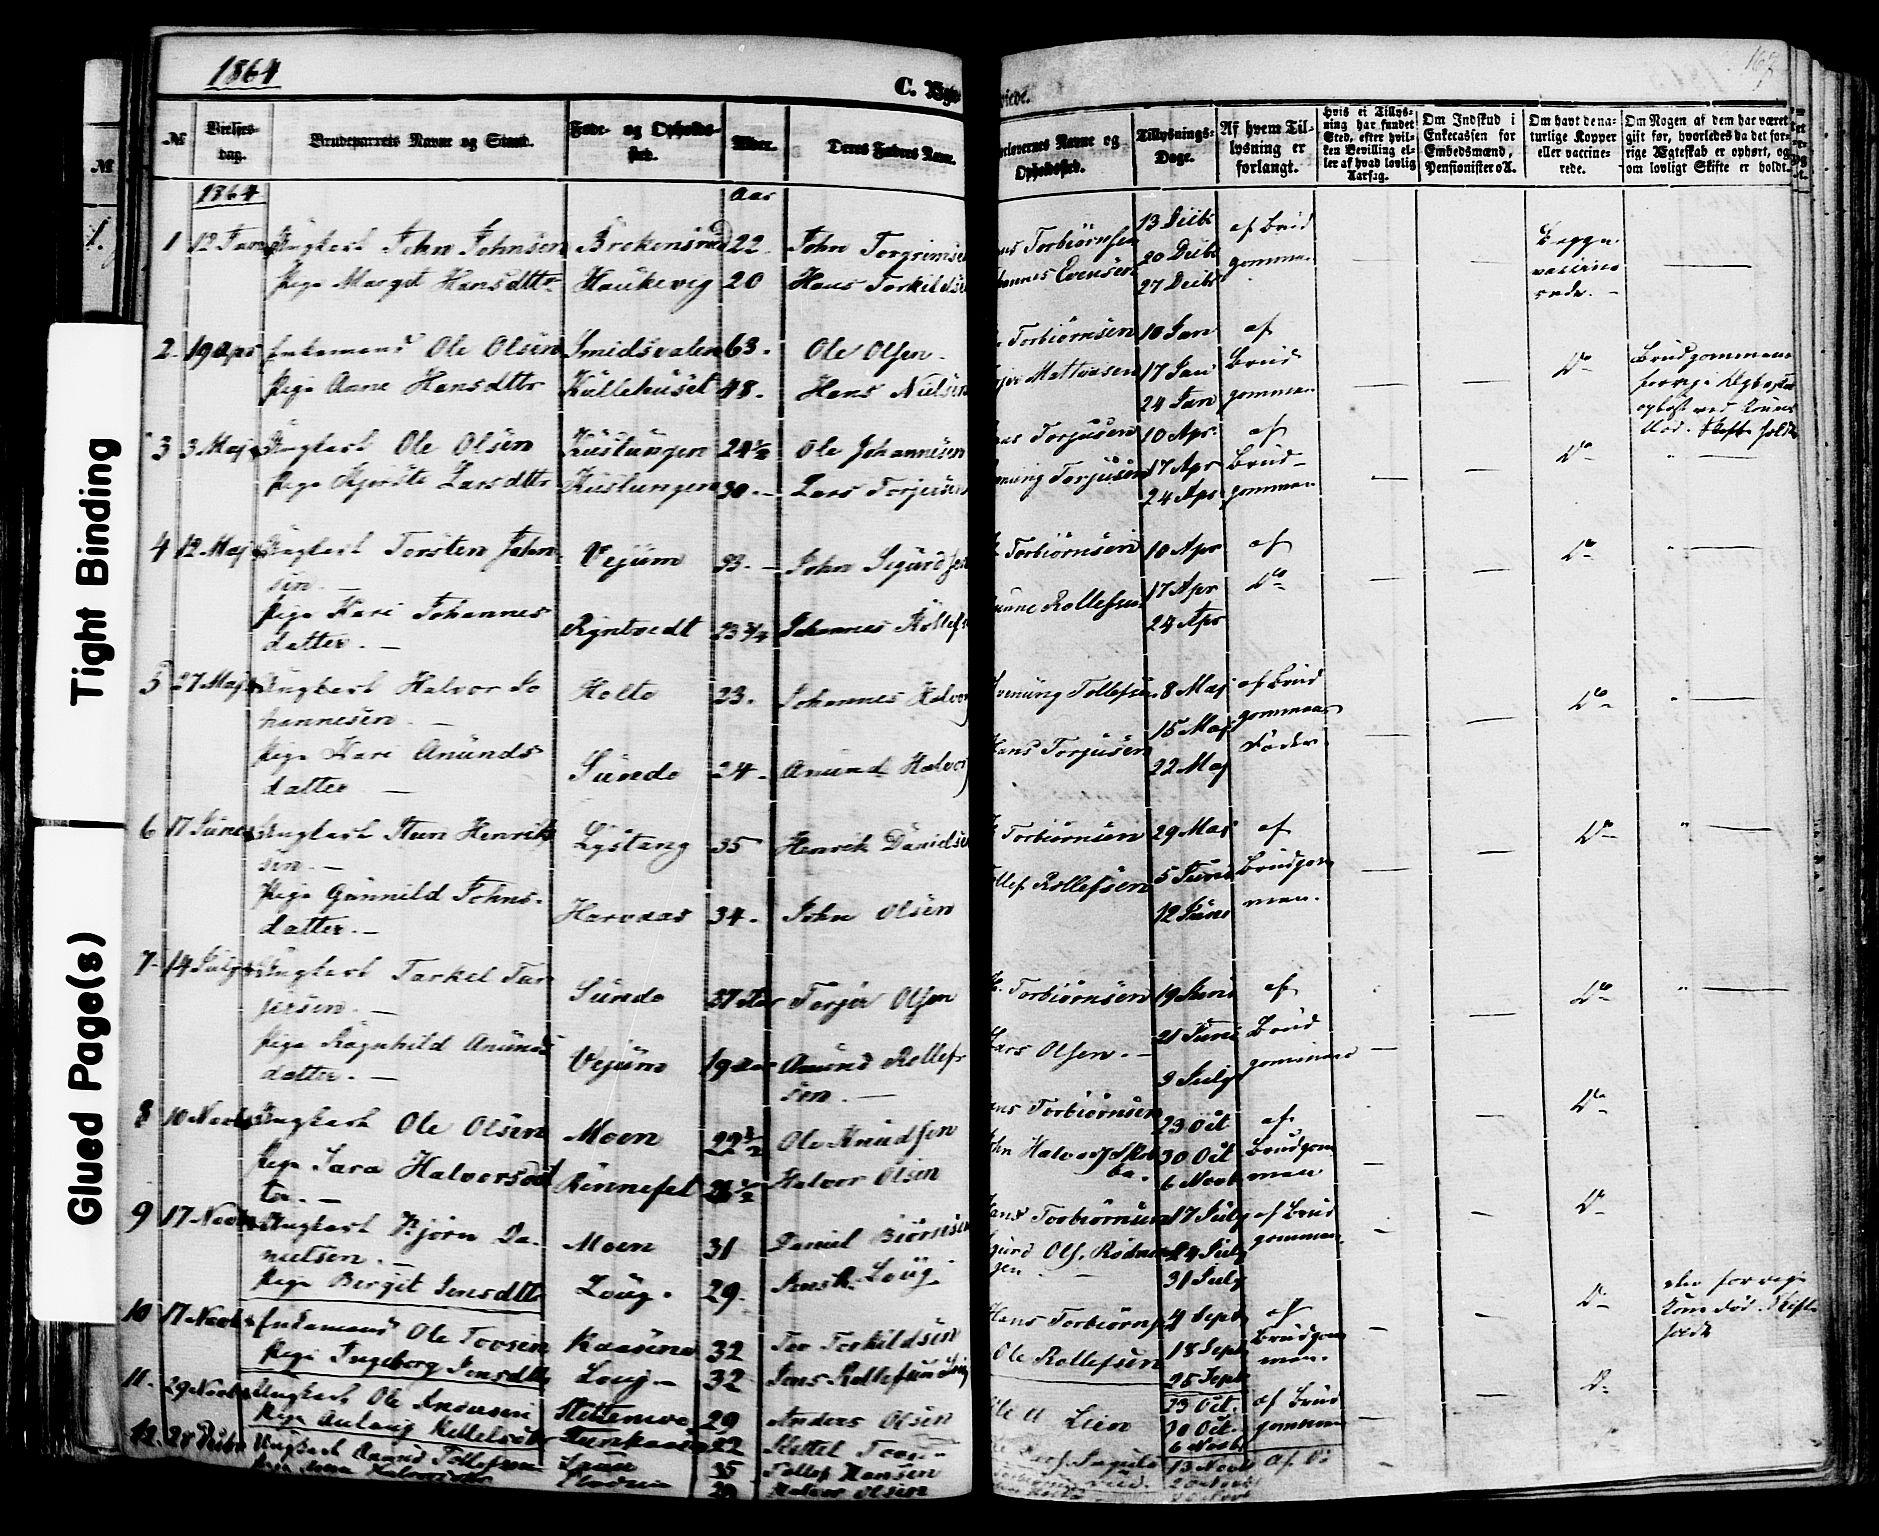 SAKO, Sauherad kirkebøker, F/Fa/L0007: Ministerialbok nr. I 7, 1851-1873, s. 167